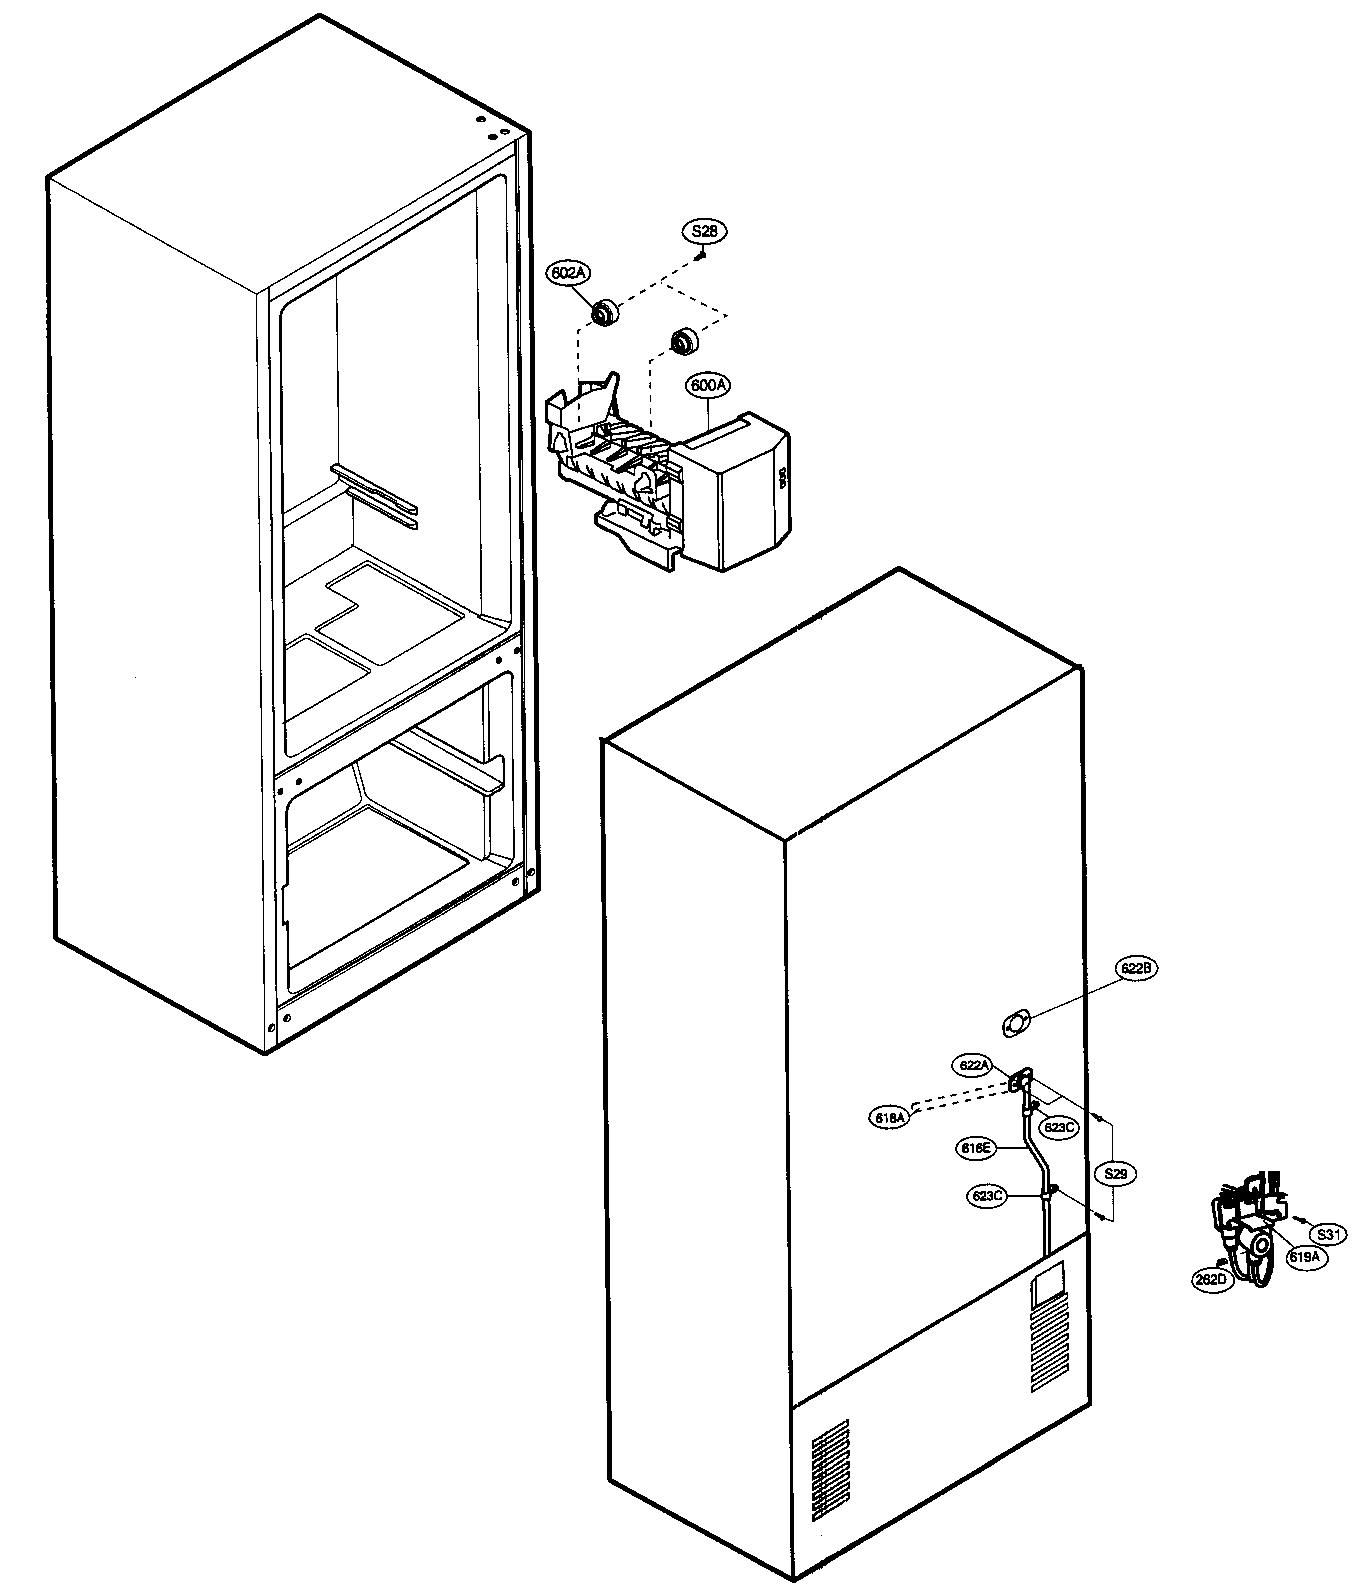 Lg model LRBC20512WW bottom-mount refrigerator genuine parts